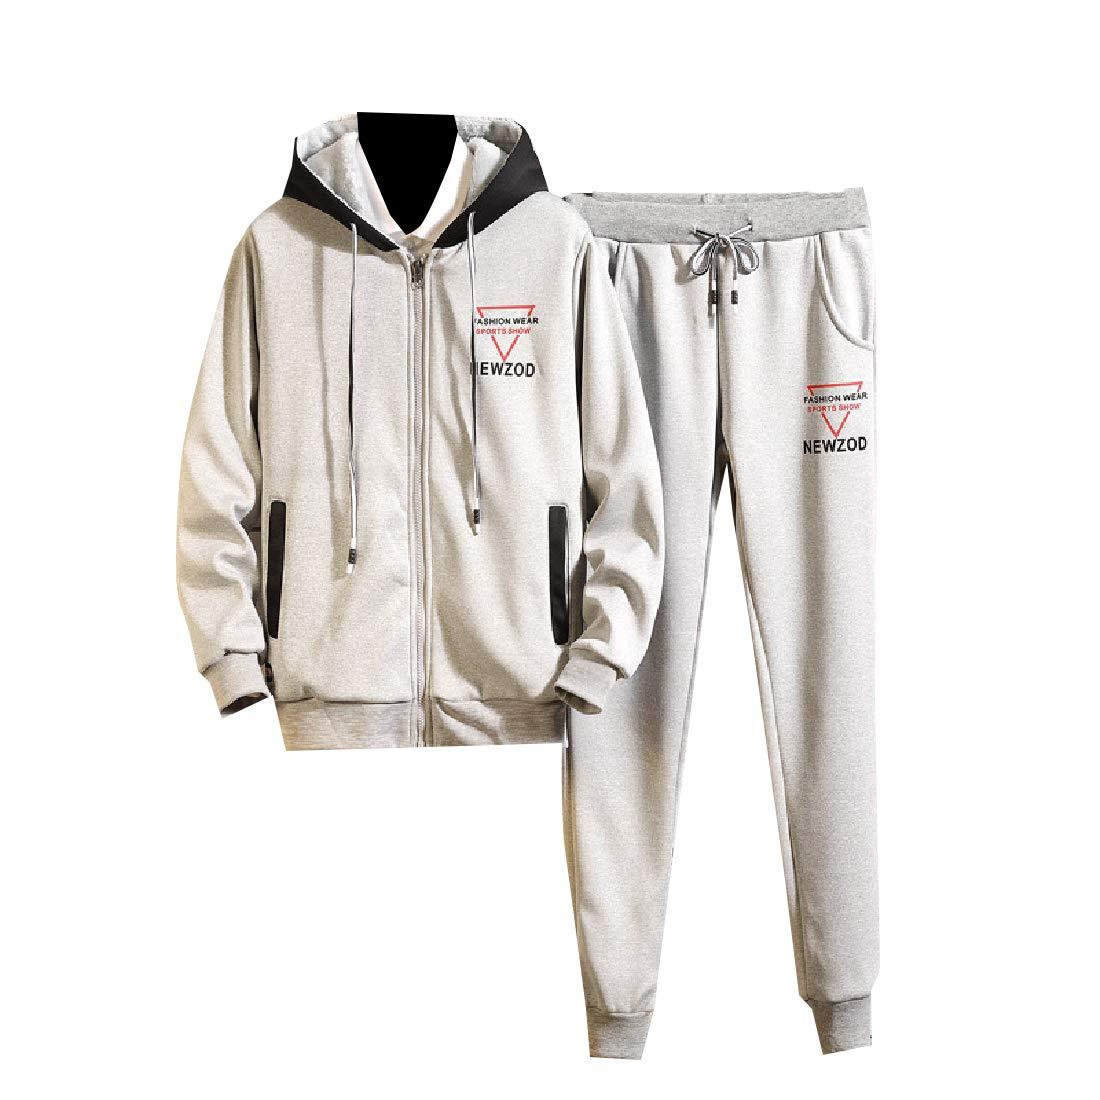 Winwinus Mens Hoodie Active Fleece Casual 2-Piece Slim Fit Tracksuit Outfit